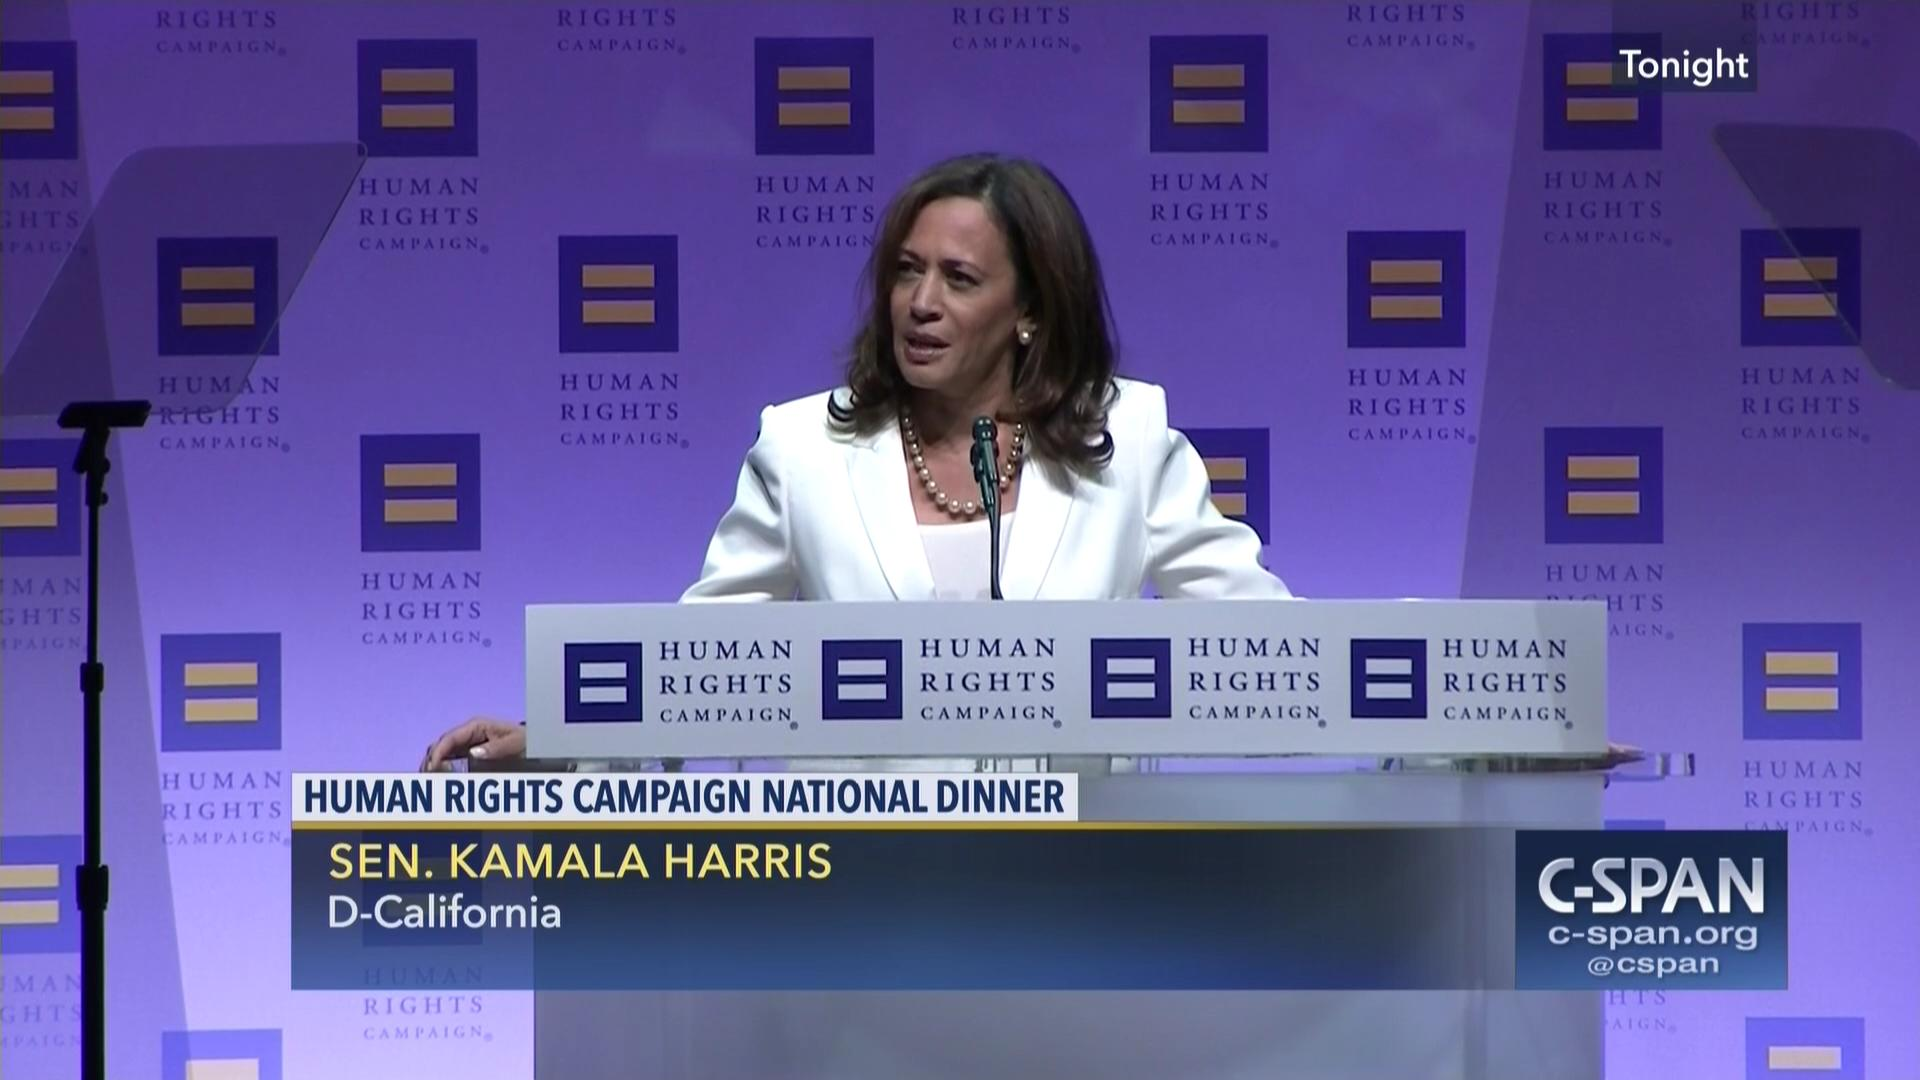 Senator Kamala Harris At Human Rights Campaign National Dinner C Span Org